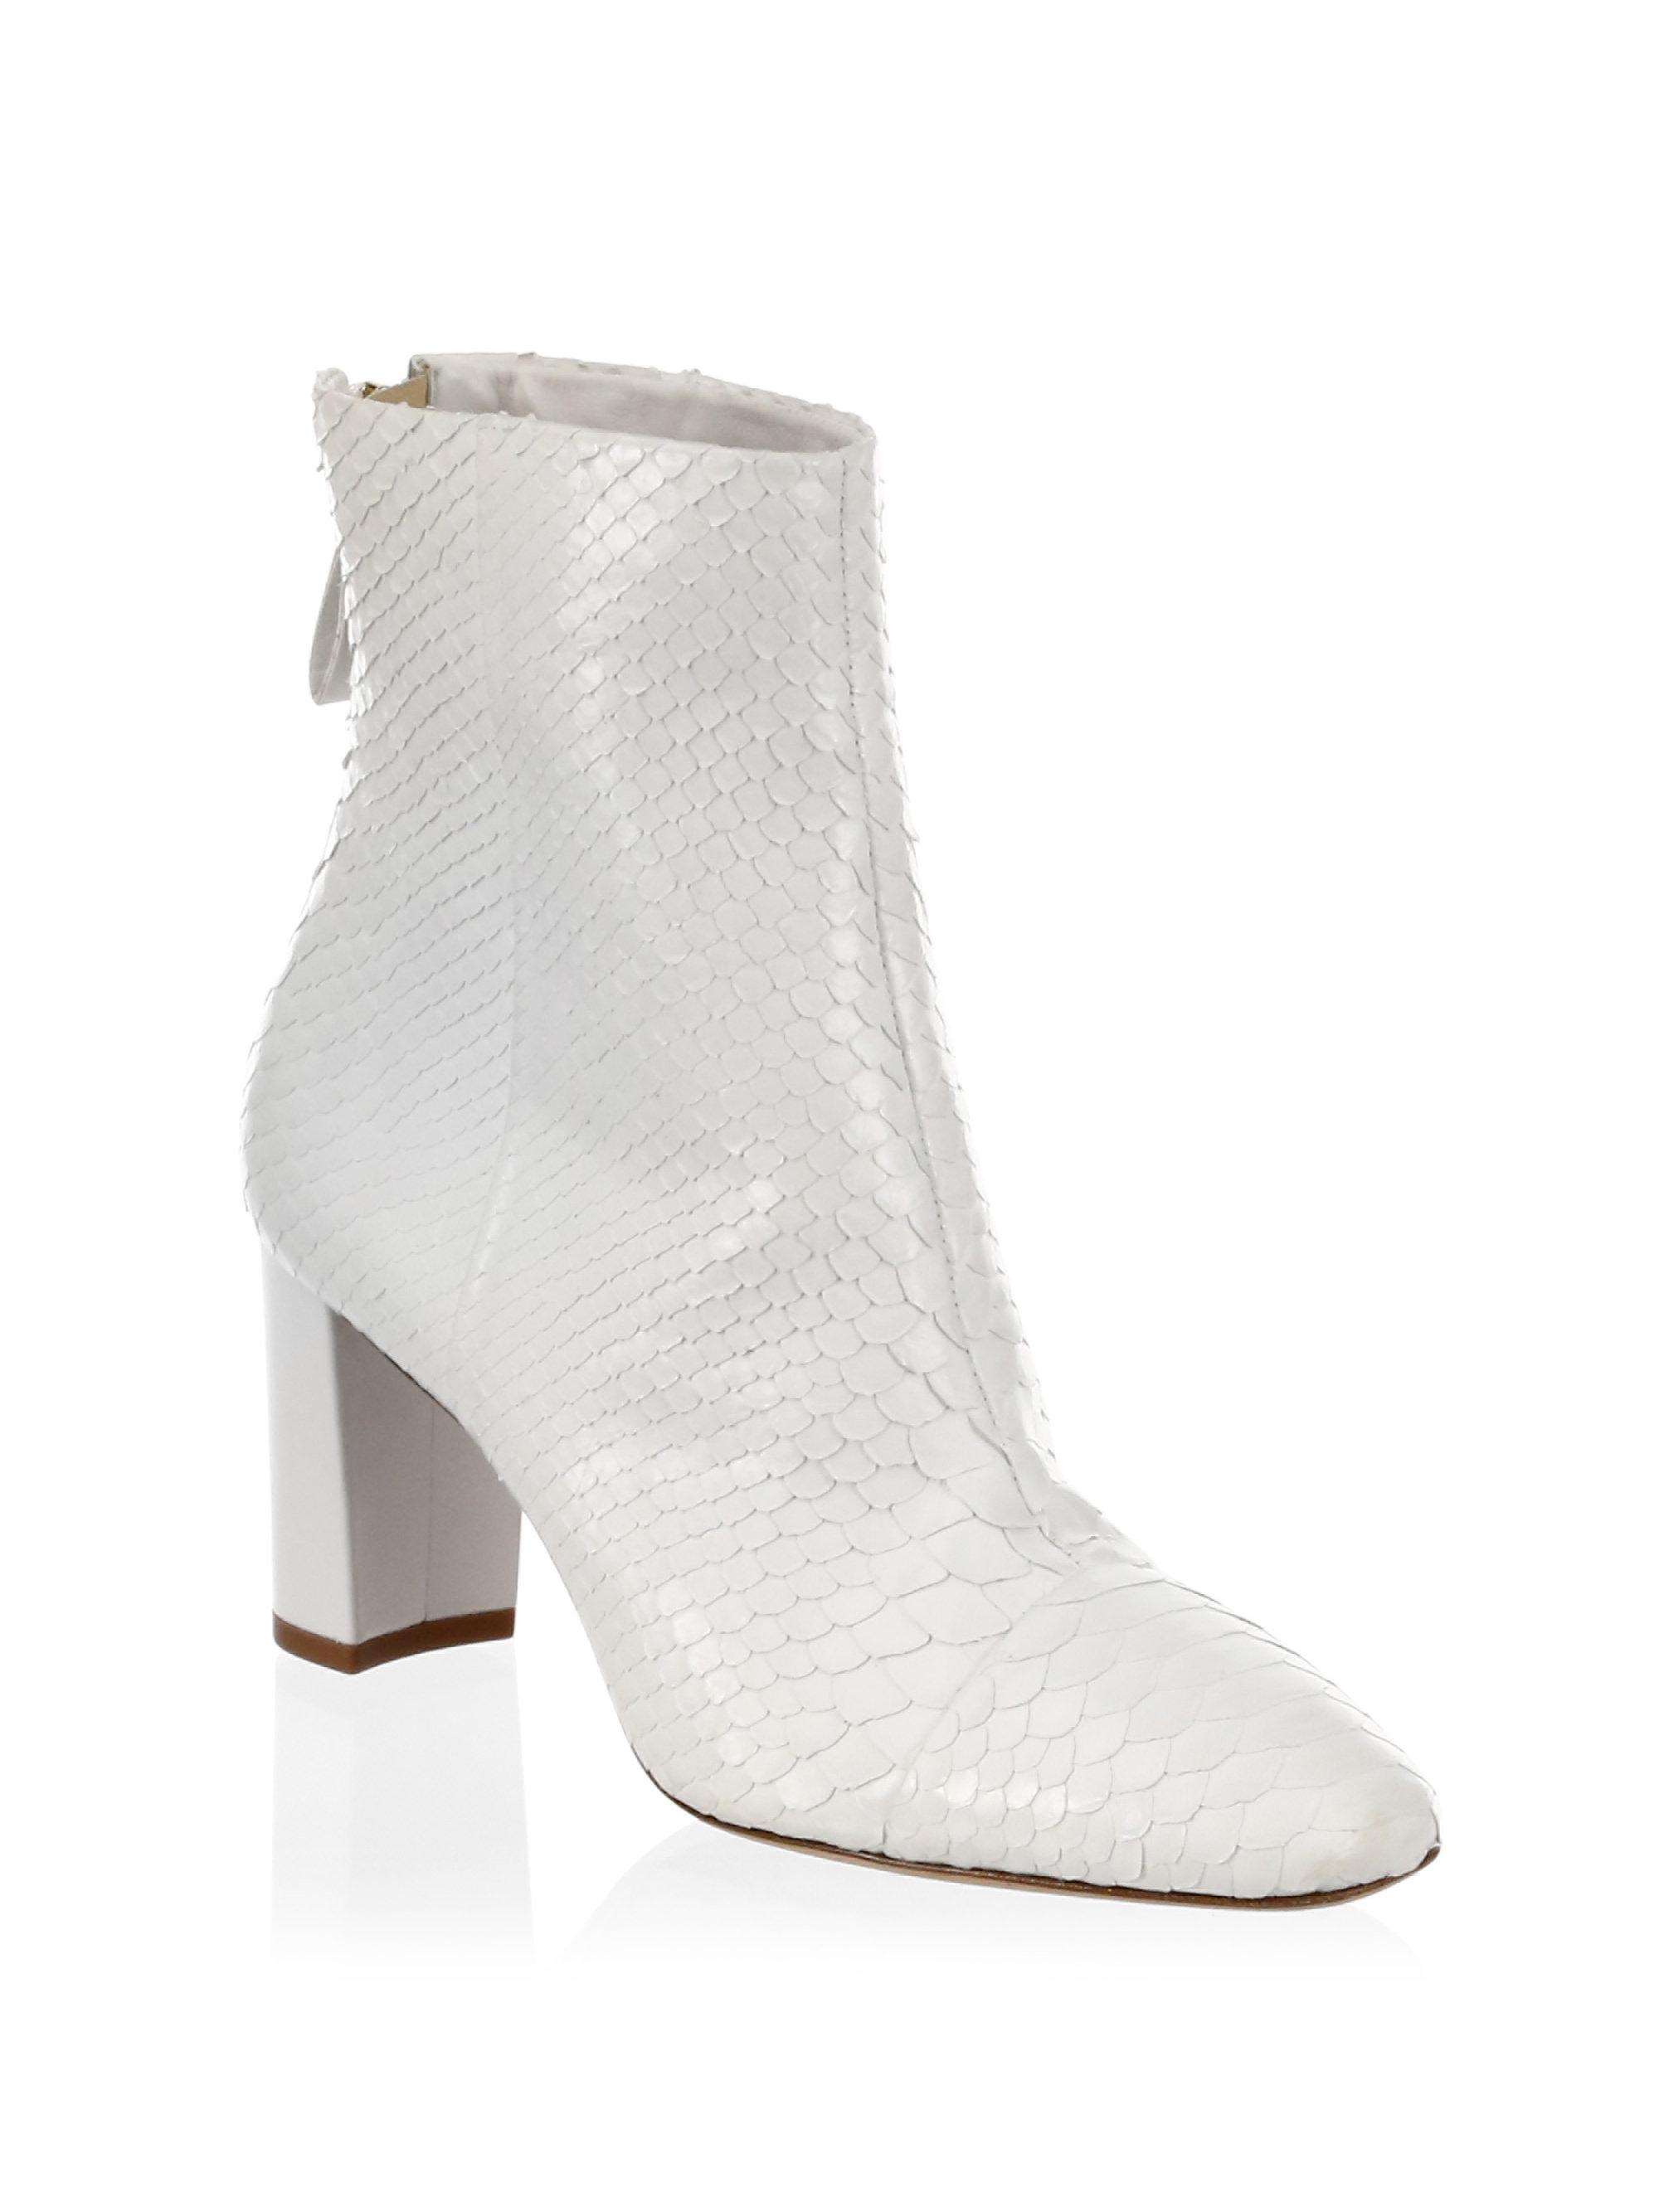 tie detail heeled booties - White Alexandre Birman NqerUoSJr